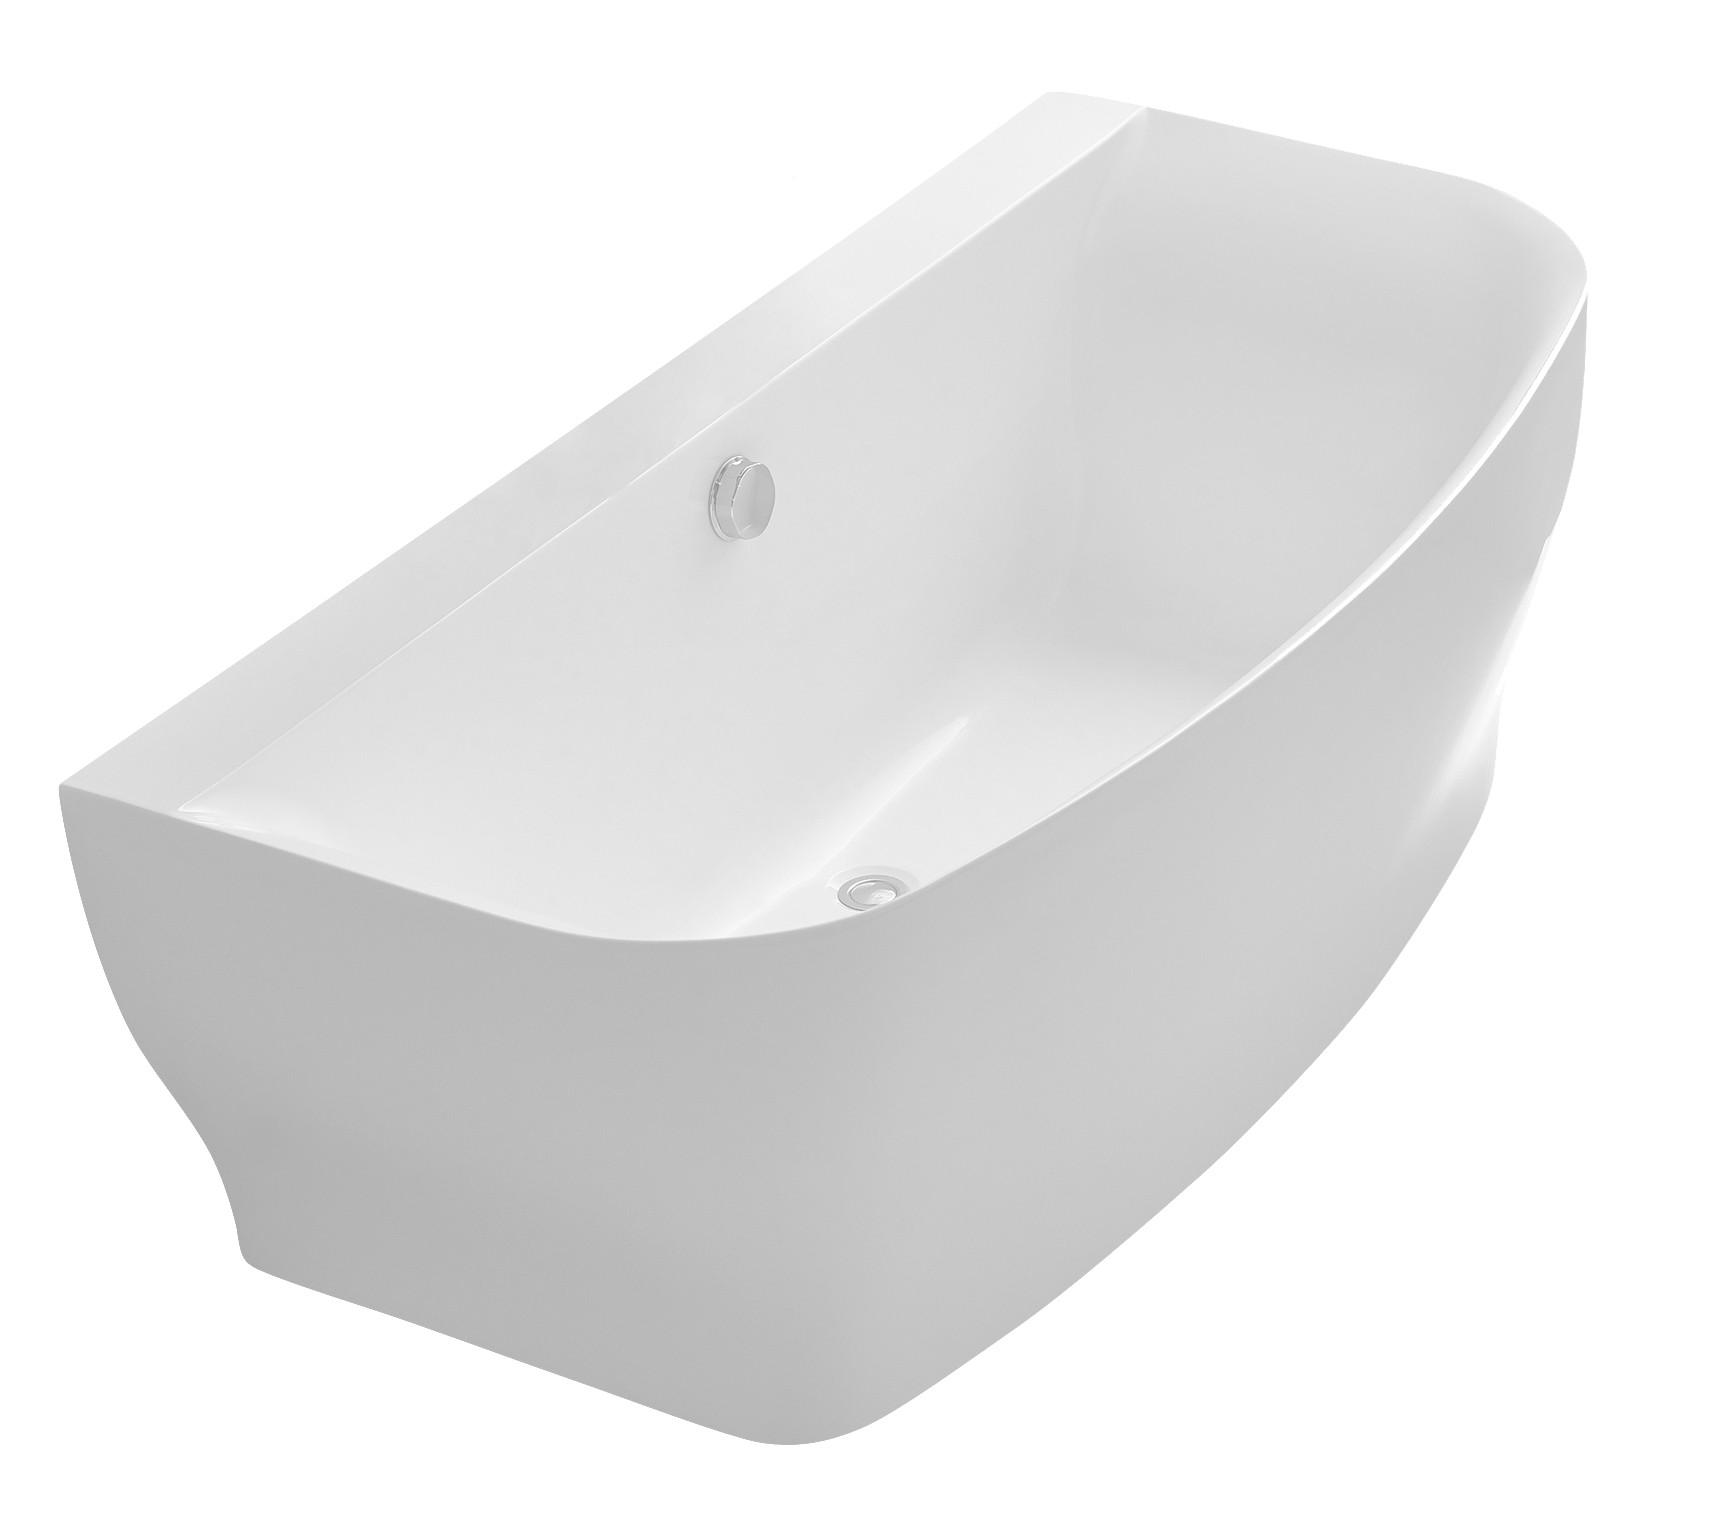 Anzzi FT-AZ112 Bank Series 5.41 ft. Freestanding Bathtub in White